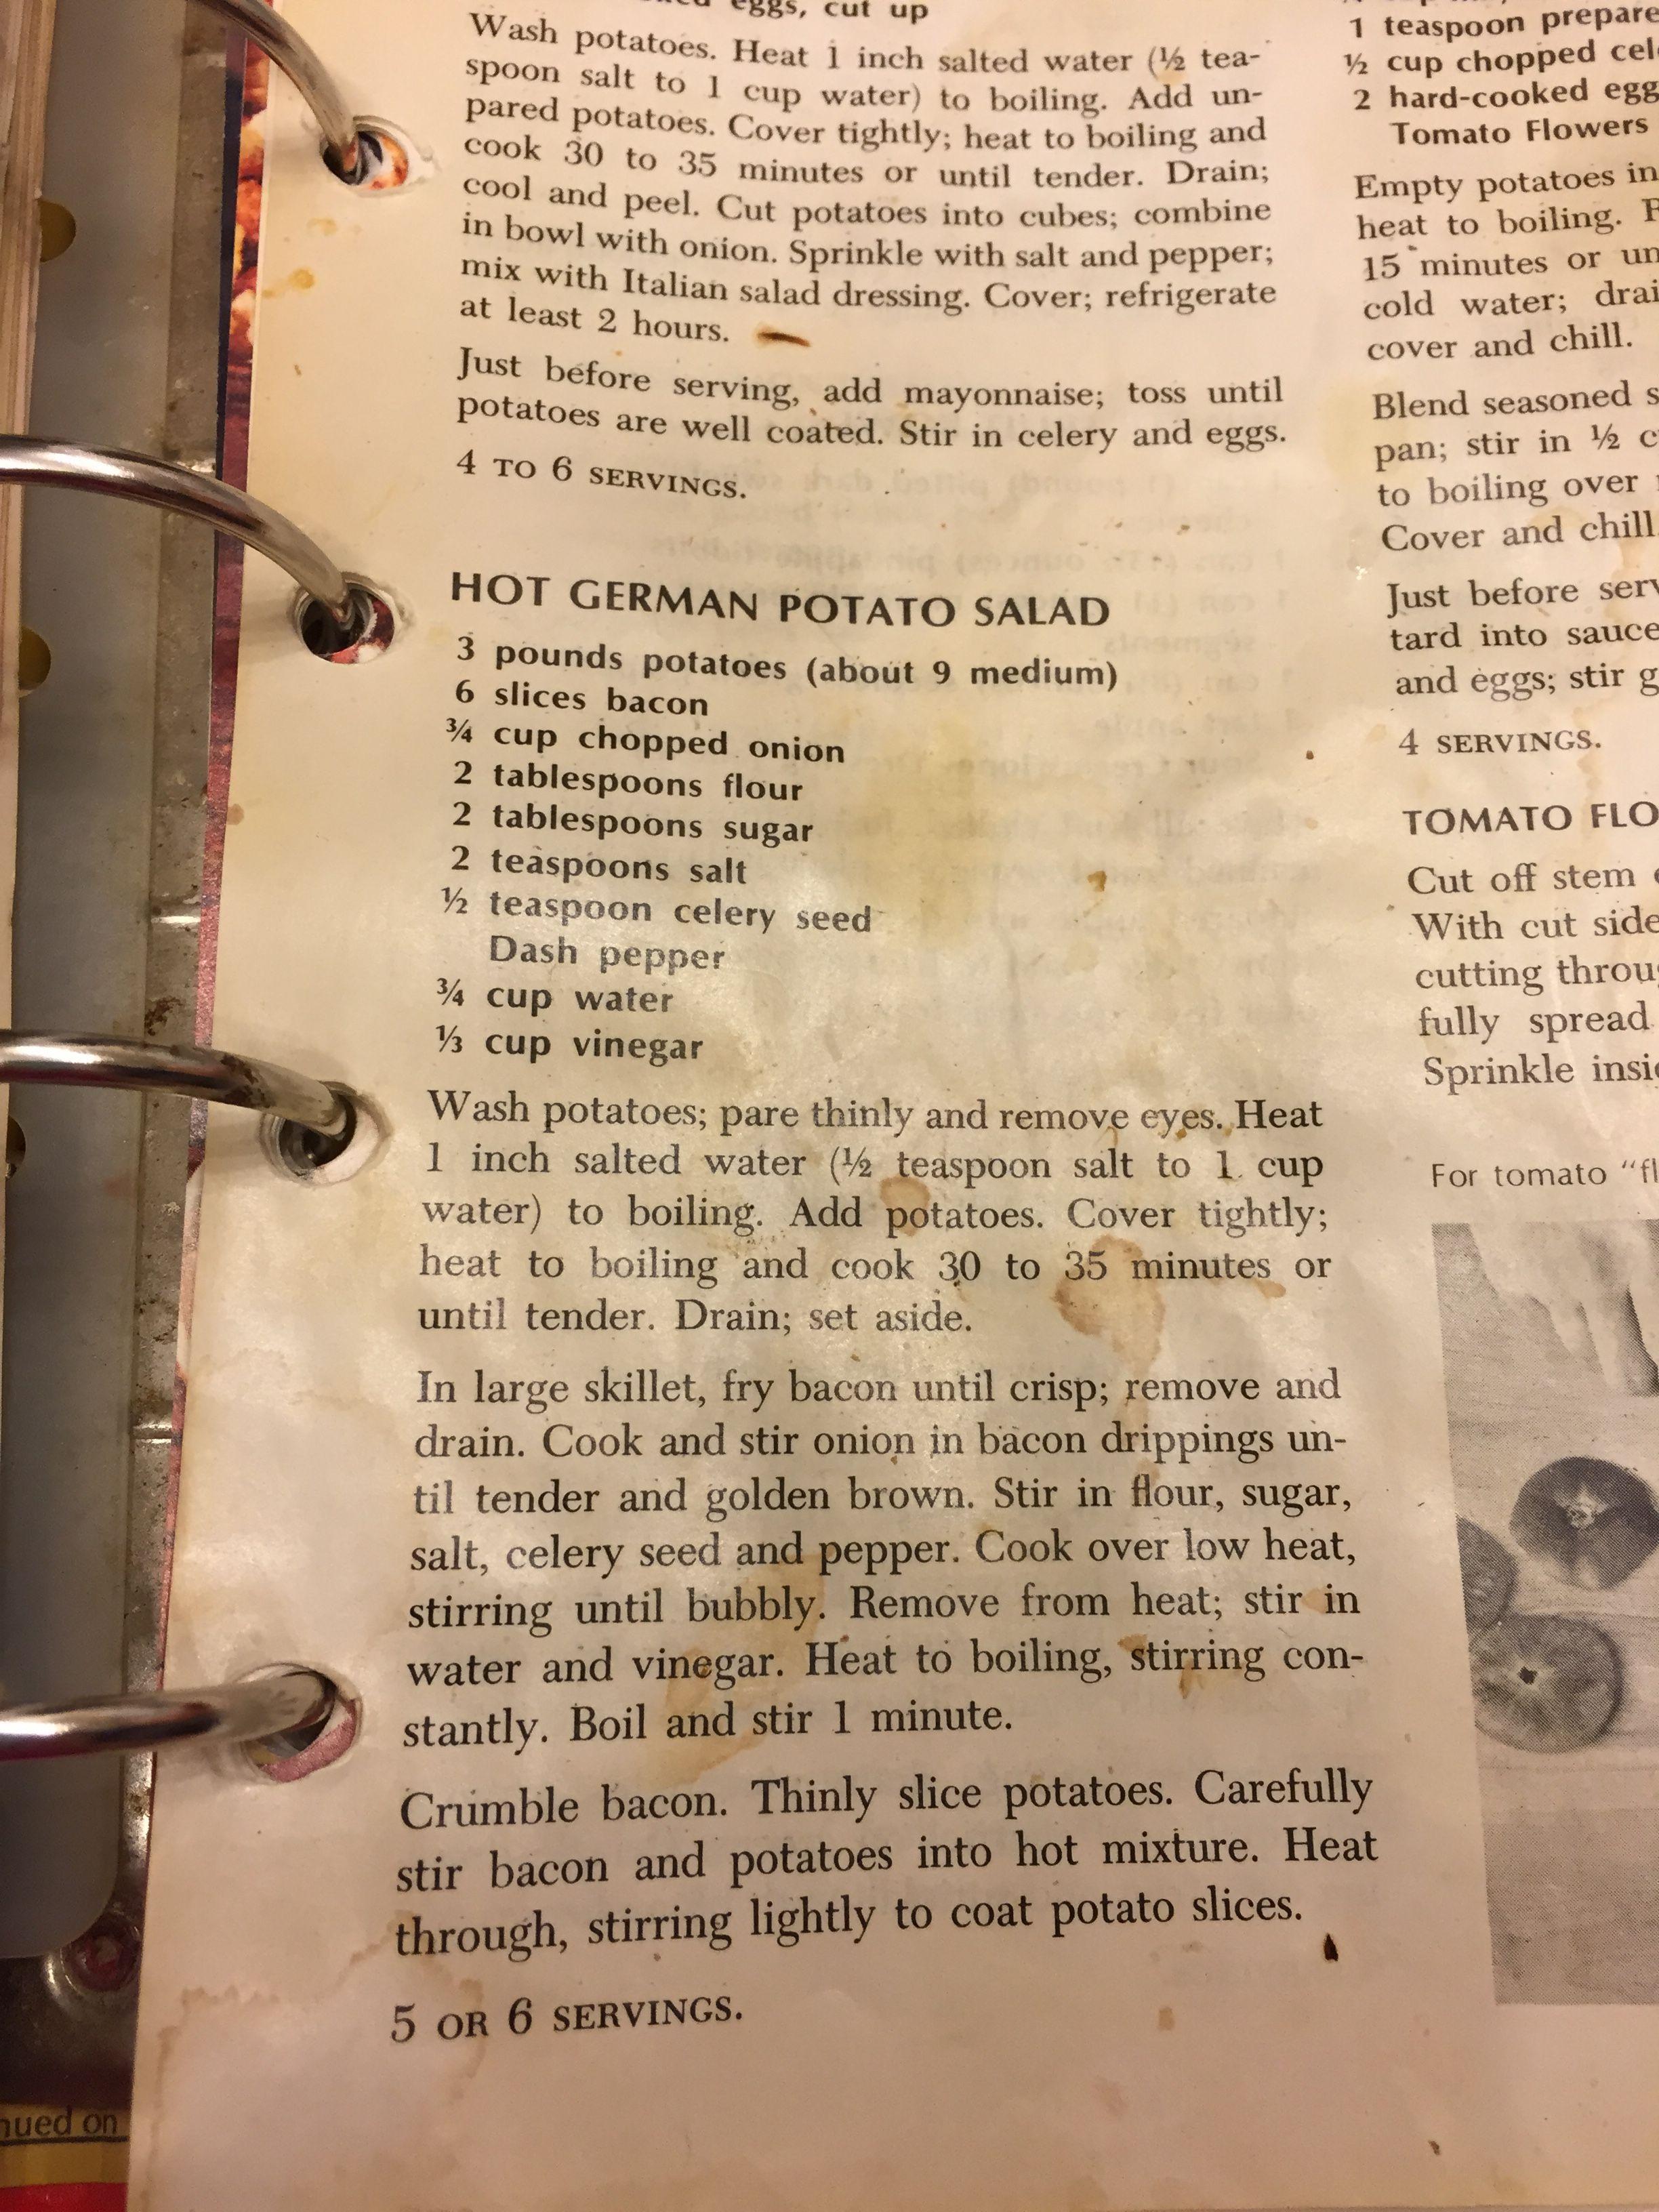 Vintage Betty Crocker Potato Salad Recipe